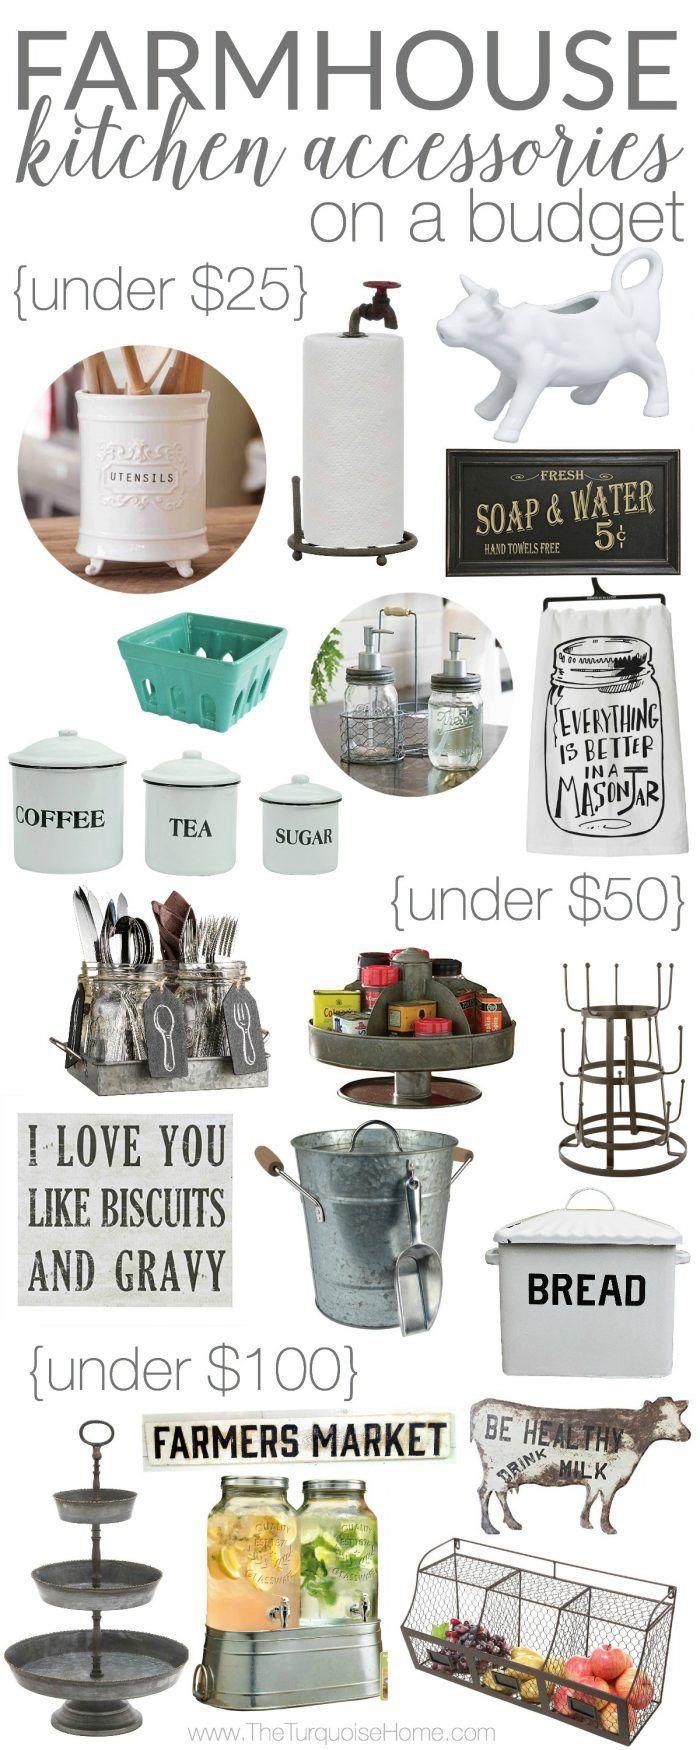 Farmhouse Kitchen Accessories on a Budget | Farmhouse ...